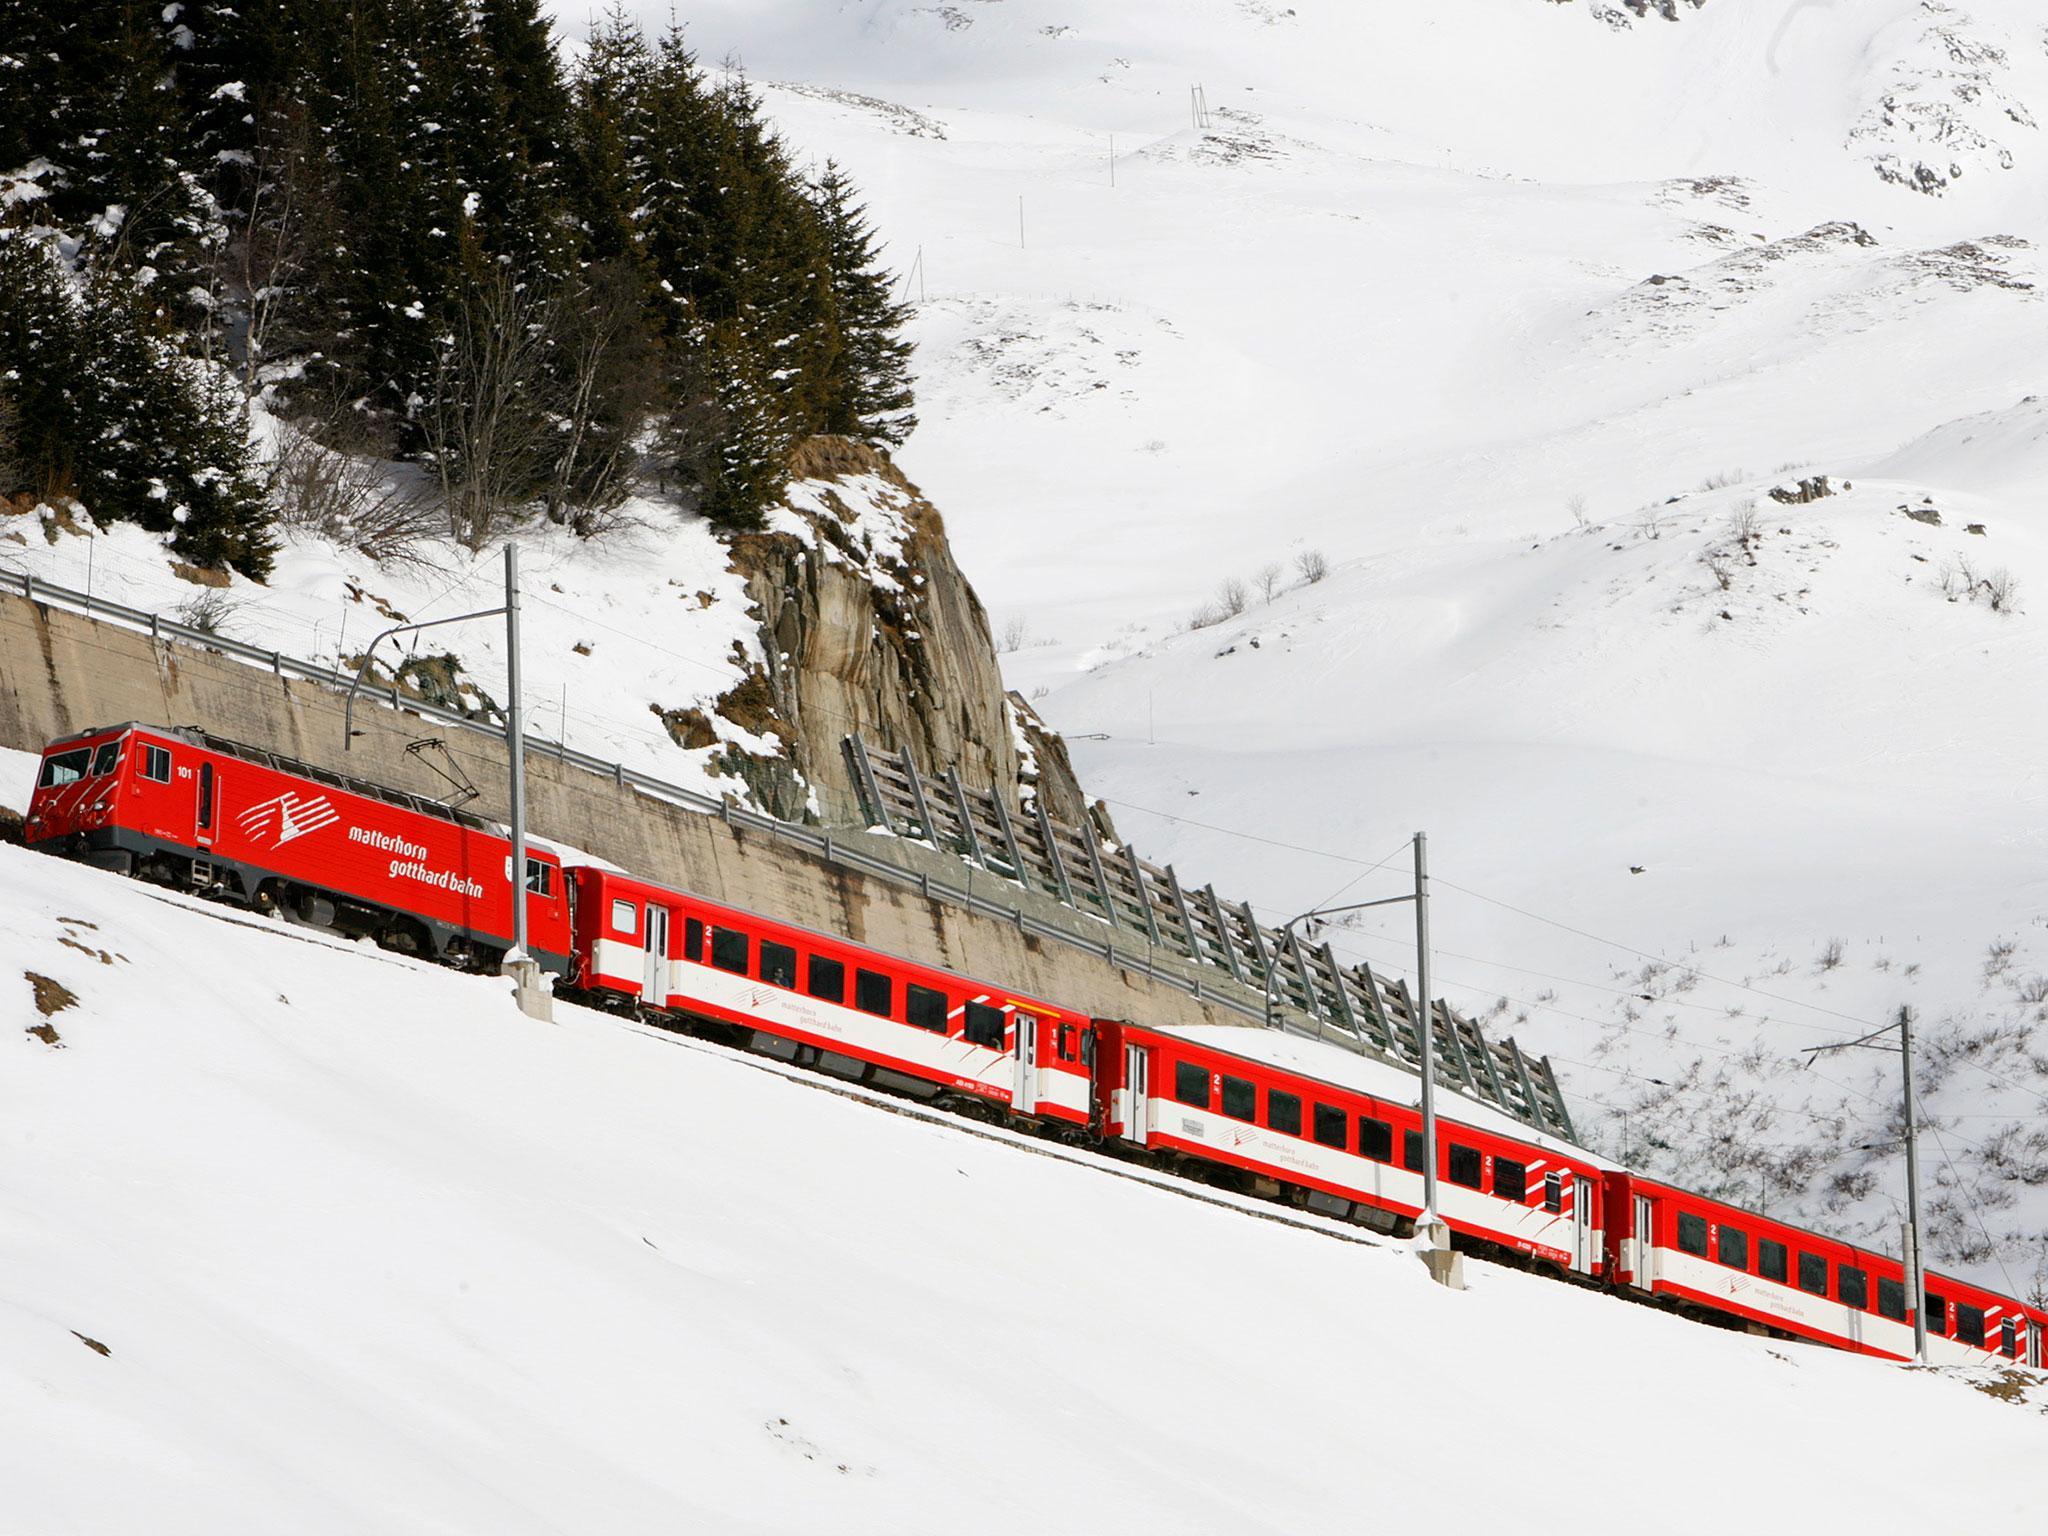 Switzerland train crash around 30 casualties after two for Baxter svizzera